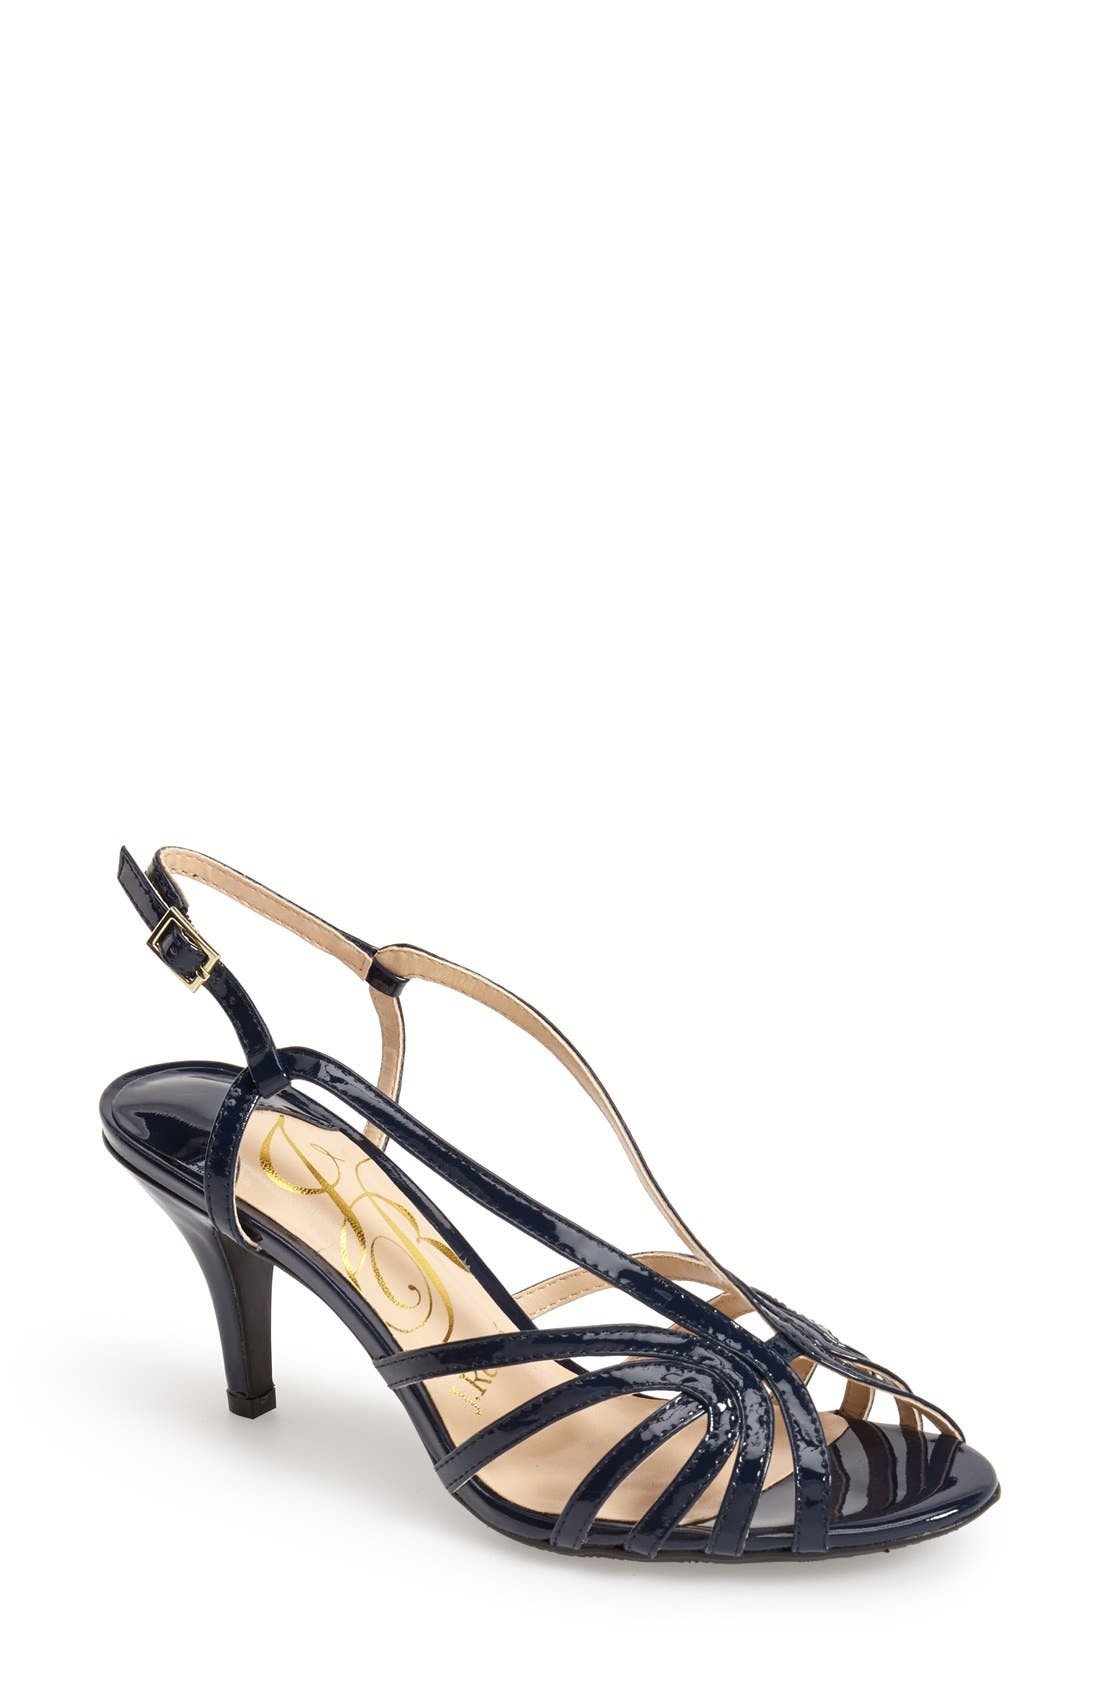 Main Image - J. Reneé 'Evra' Sandal